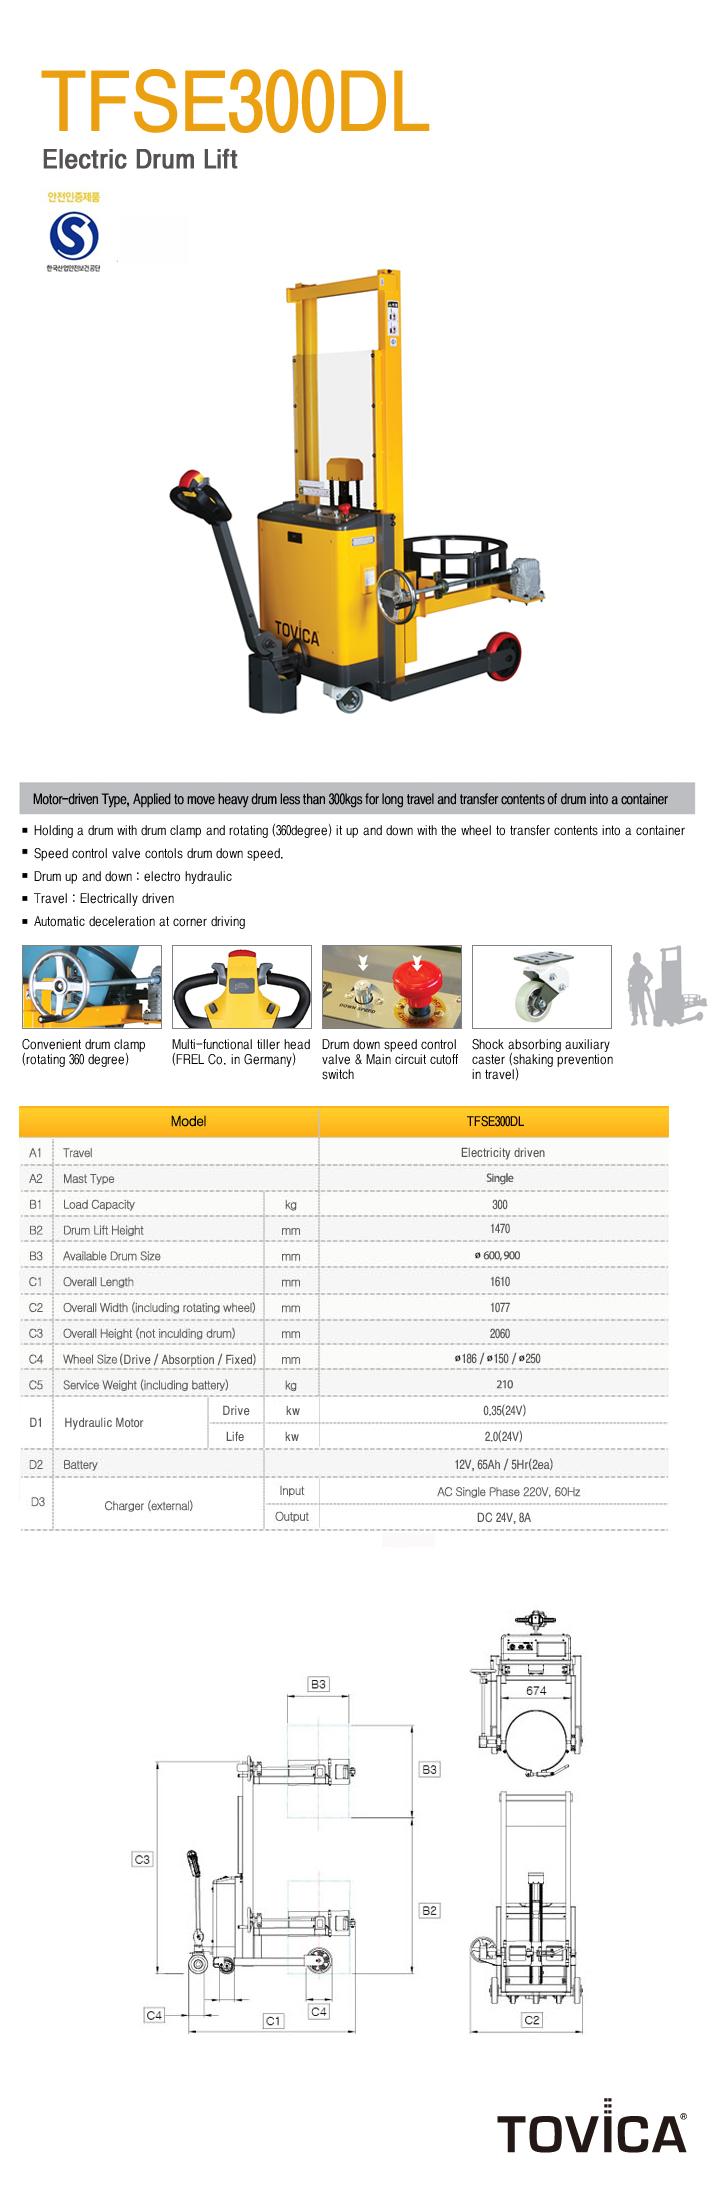 TAEJIN ENG Electric Drum Lift TFSE300DL